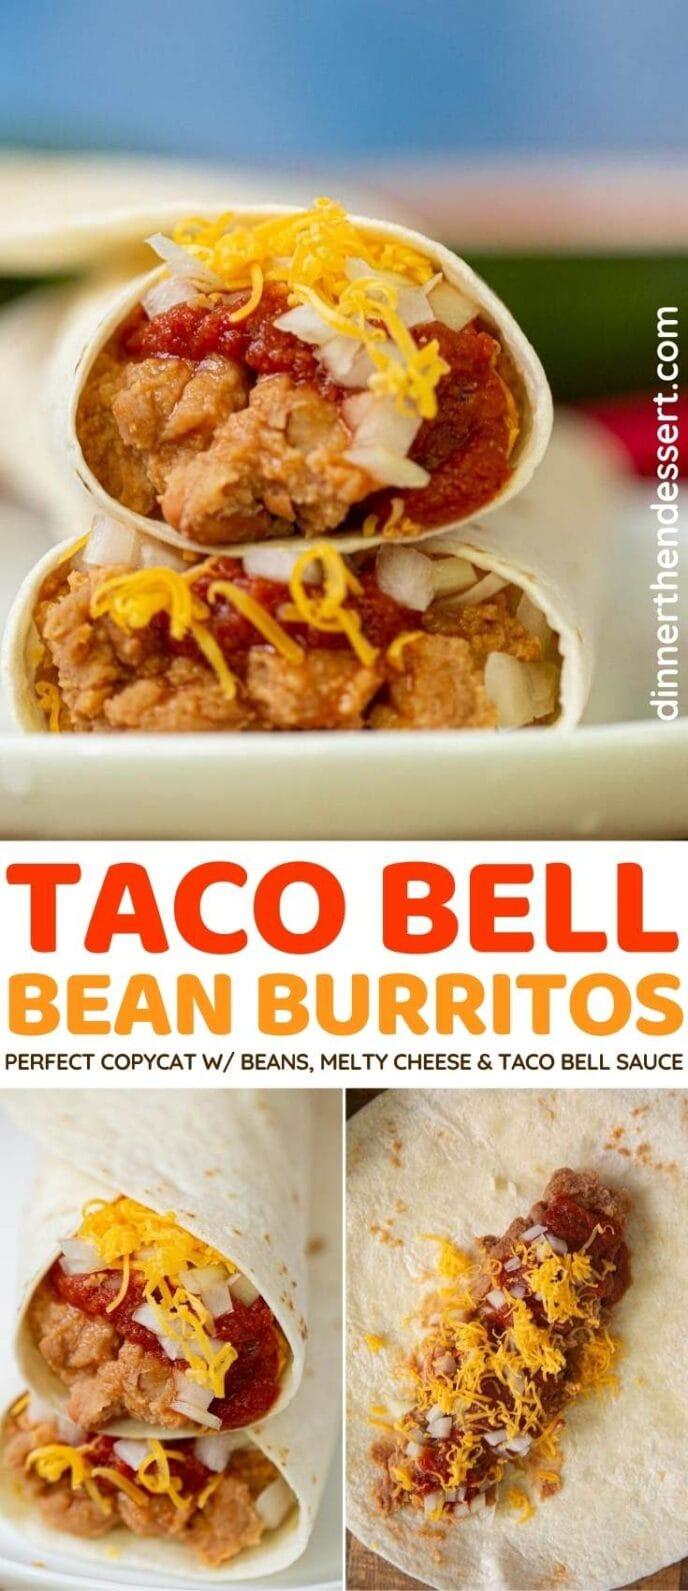 Taco Bell Bean Burrito collage